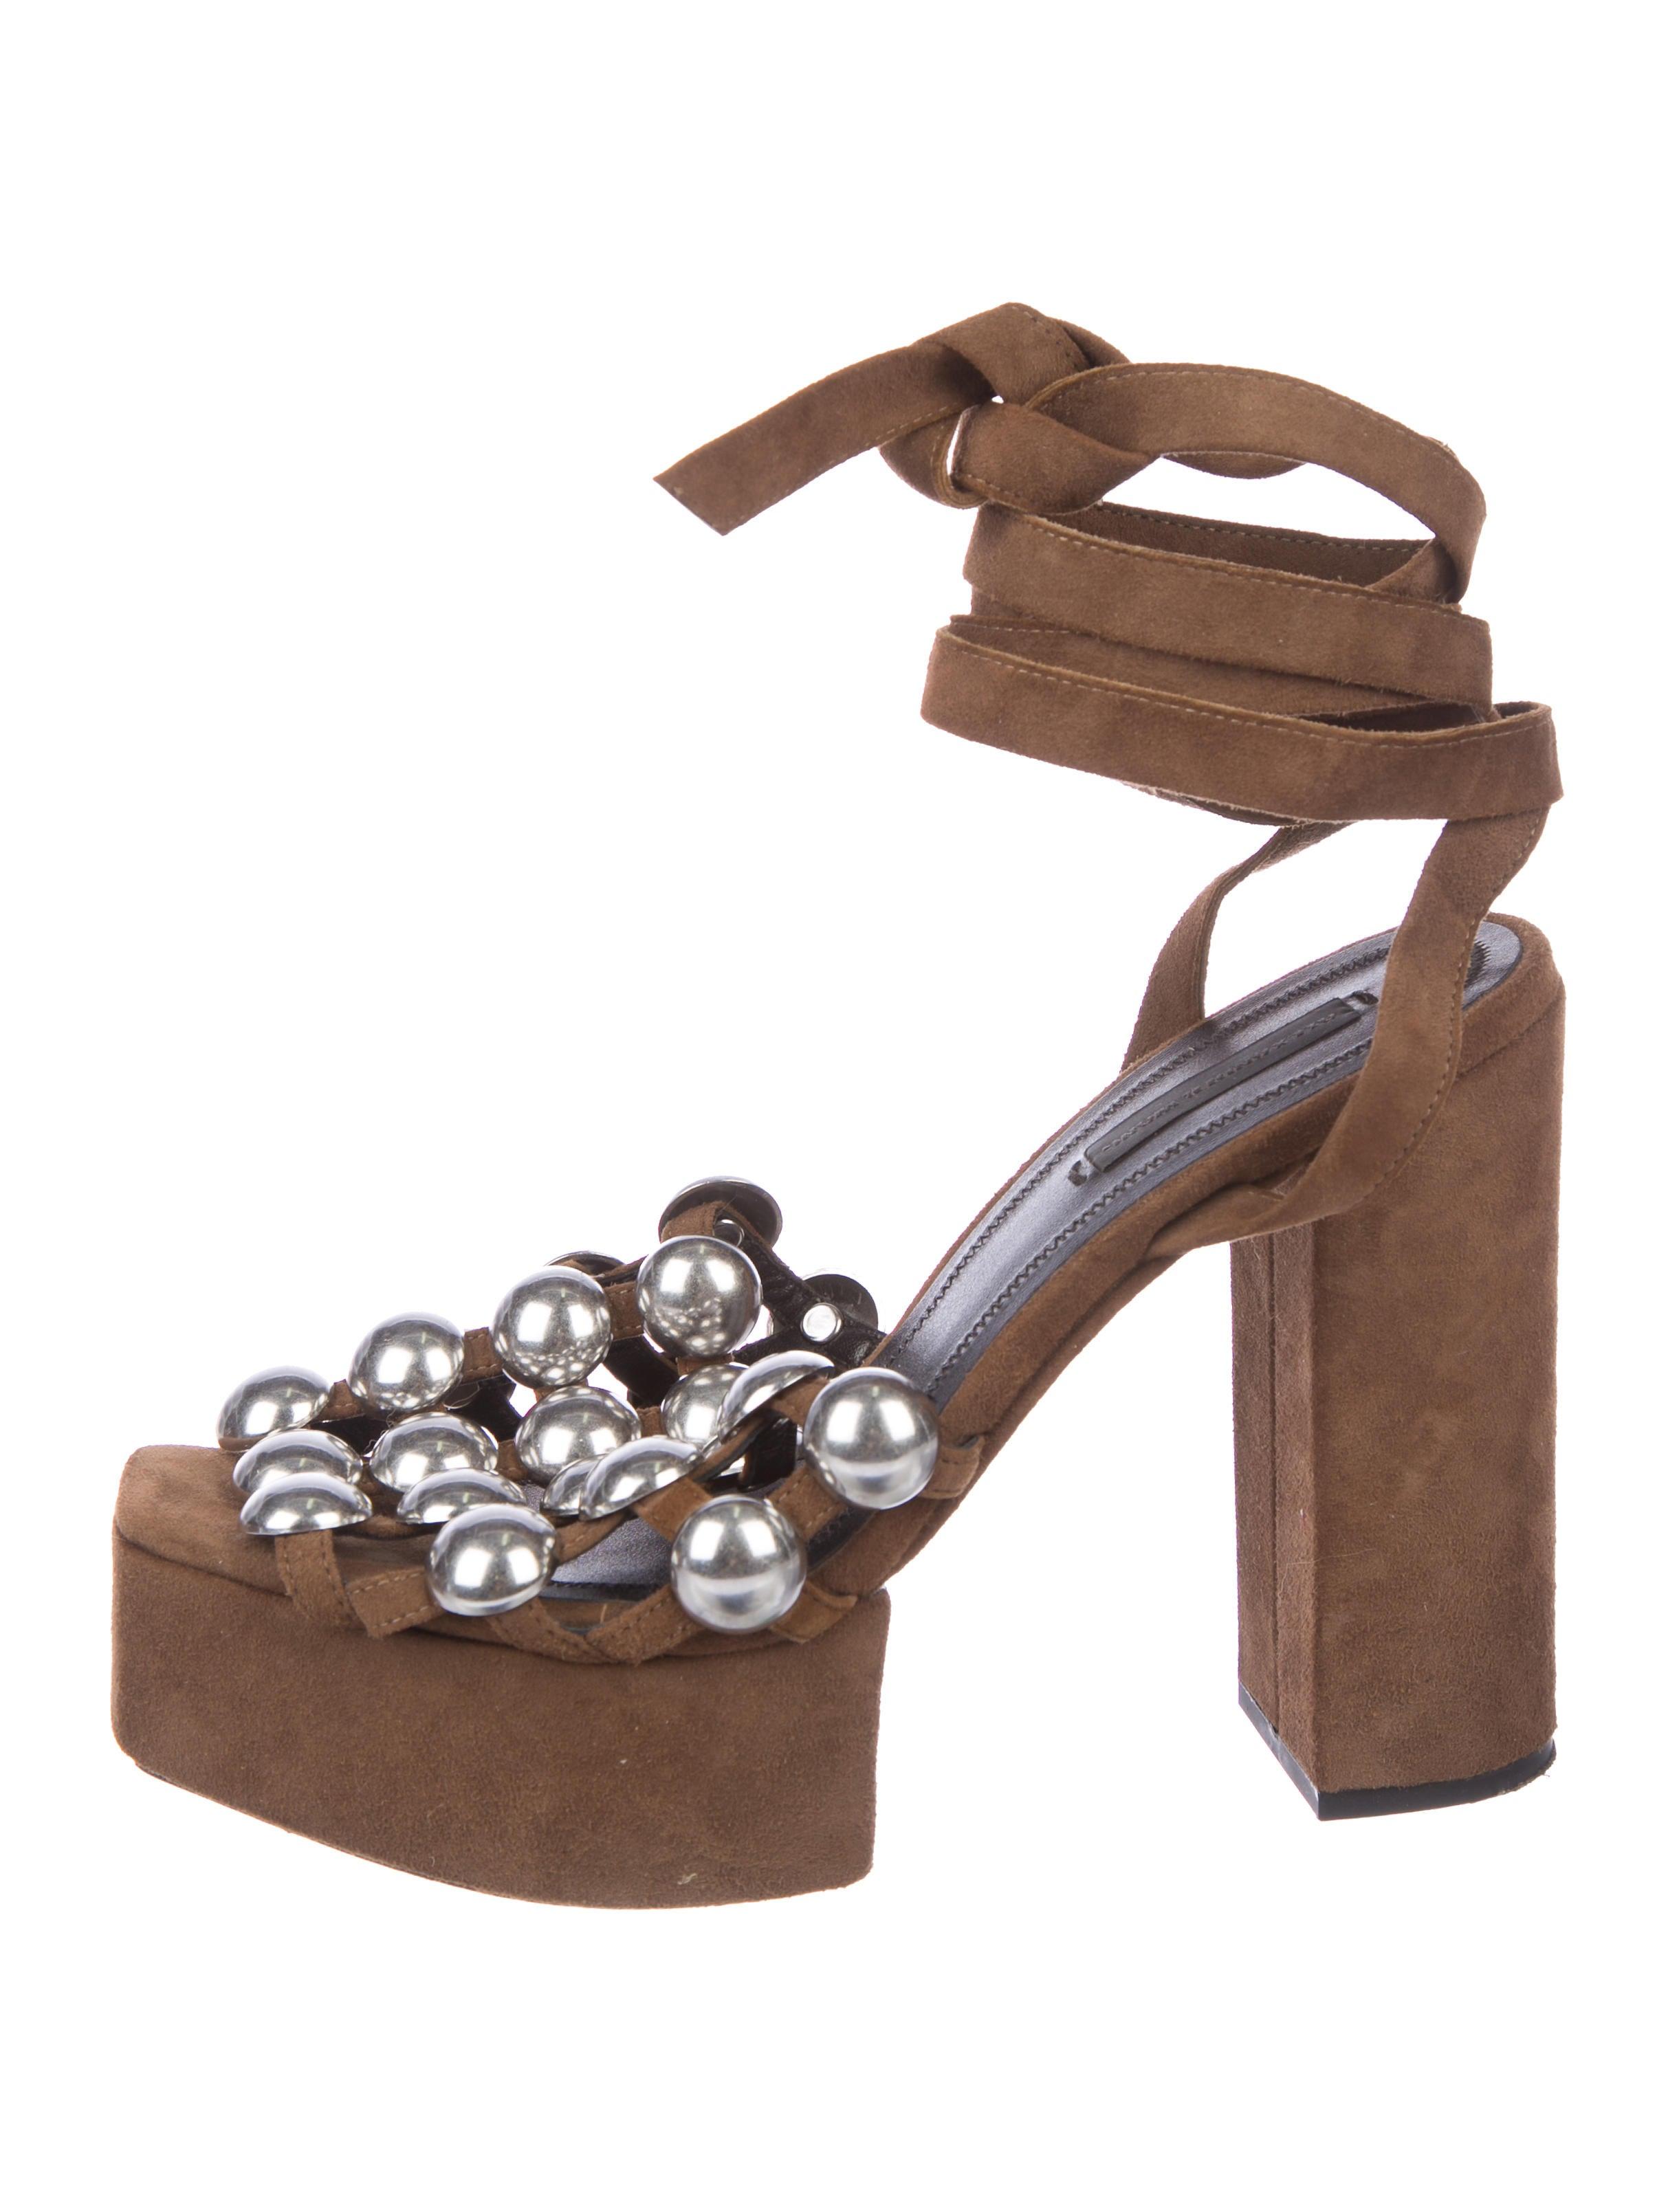 best place online tumblr for sale Alexander Wang Studded Wrap-Around Sandals outlet store P3jcIvbh7